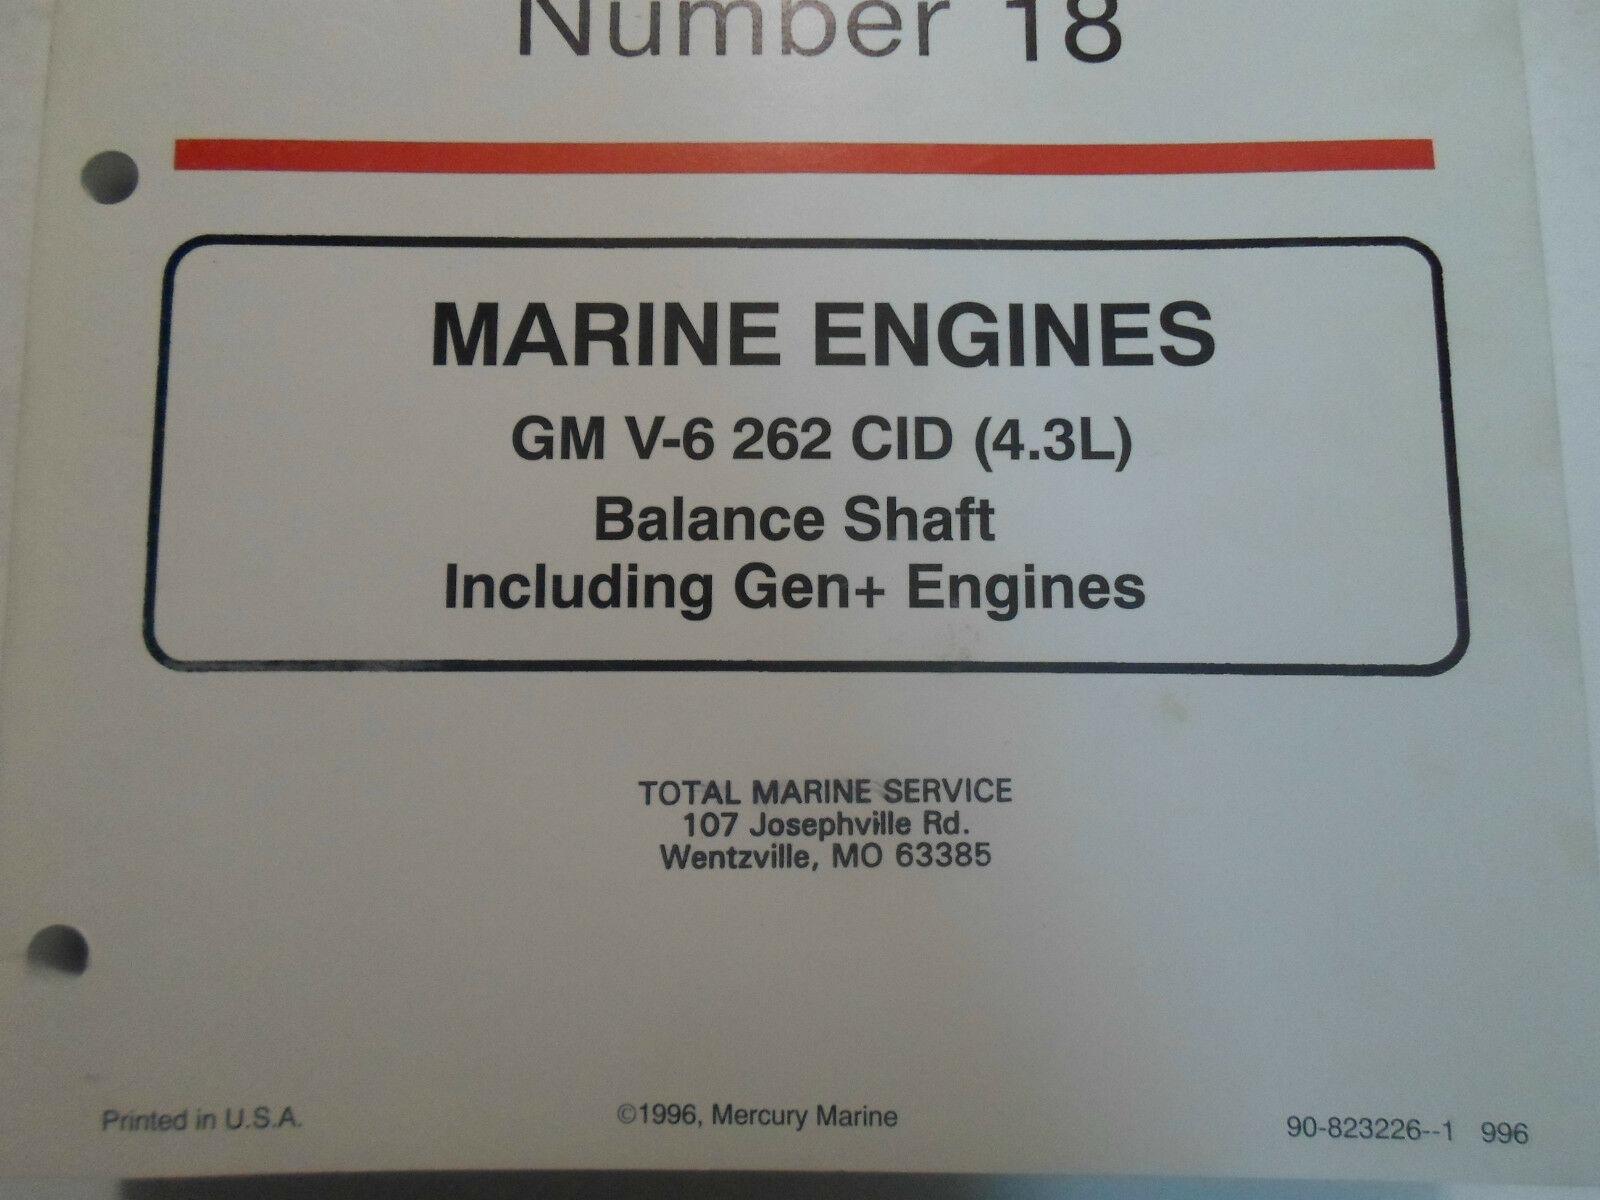 1996 Mercruiser #18 Marine Engines GM V6 262 Cid Balance Schaft Service Manuell image 2